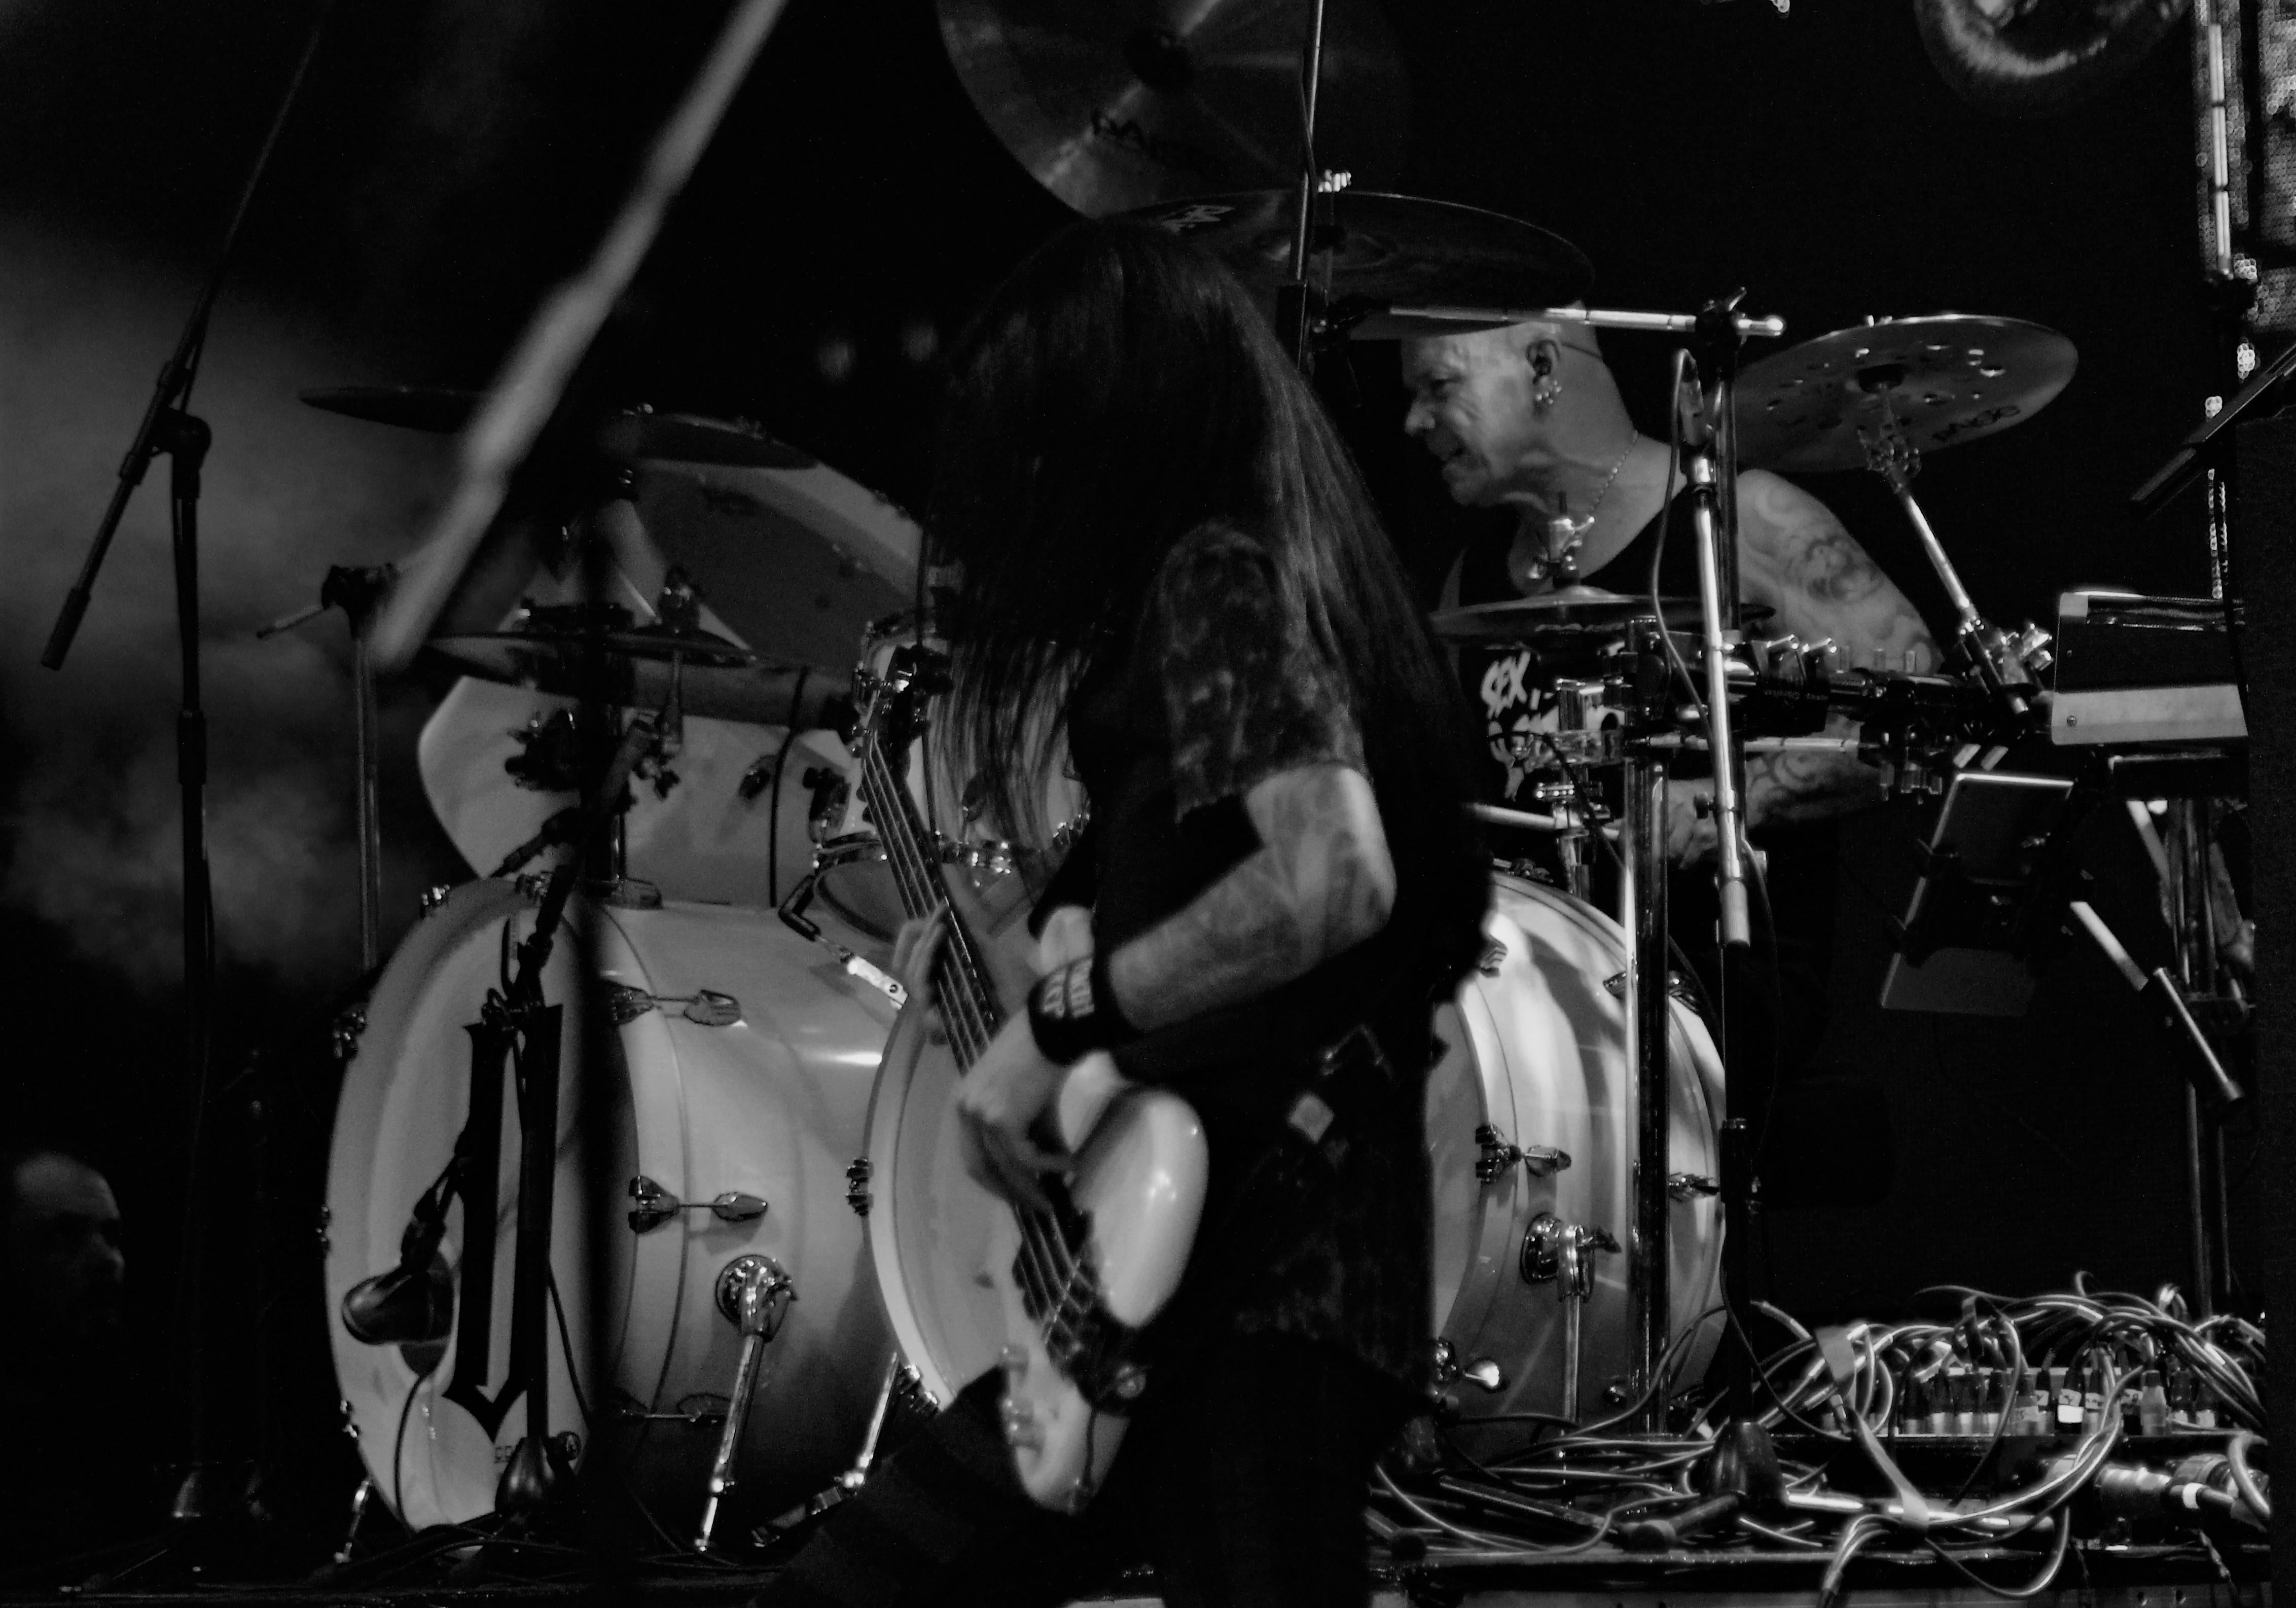 Day 2 - Main Stage_6 - Uriah Heep (9)